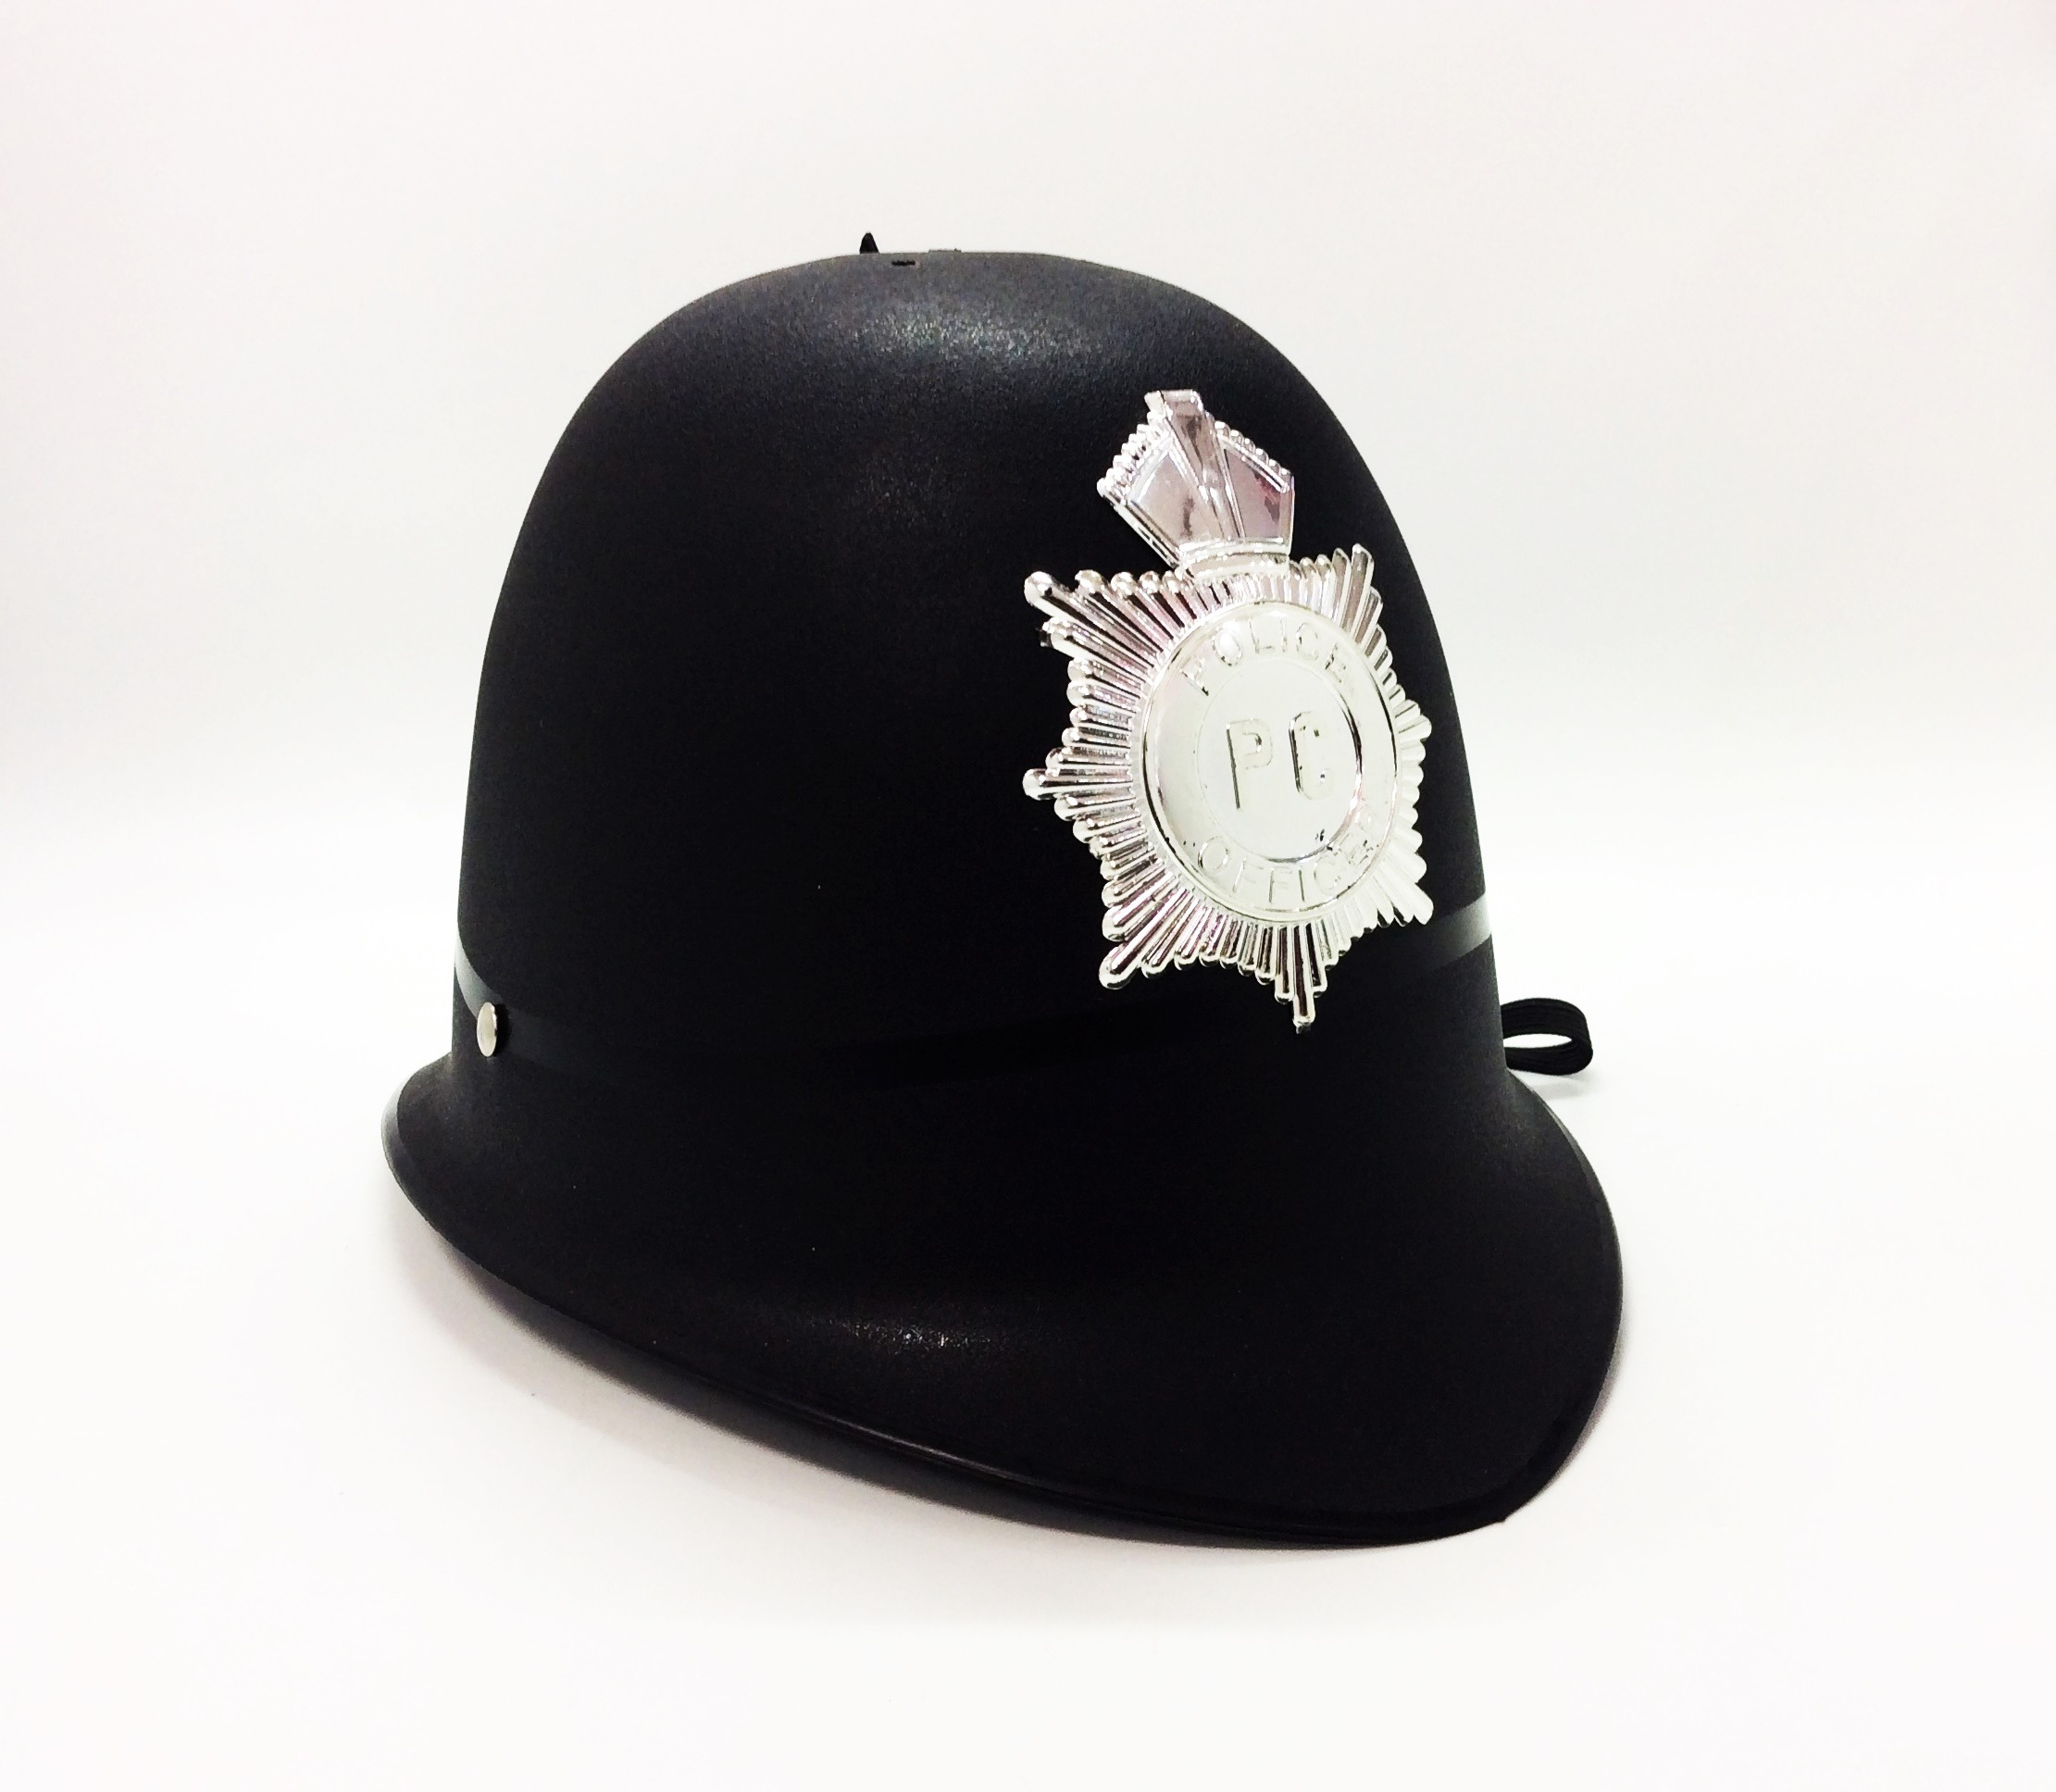 CAPACETE POLÍCIA INGLESA